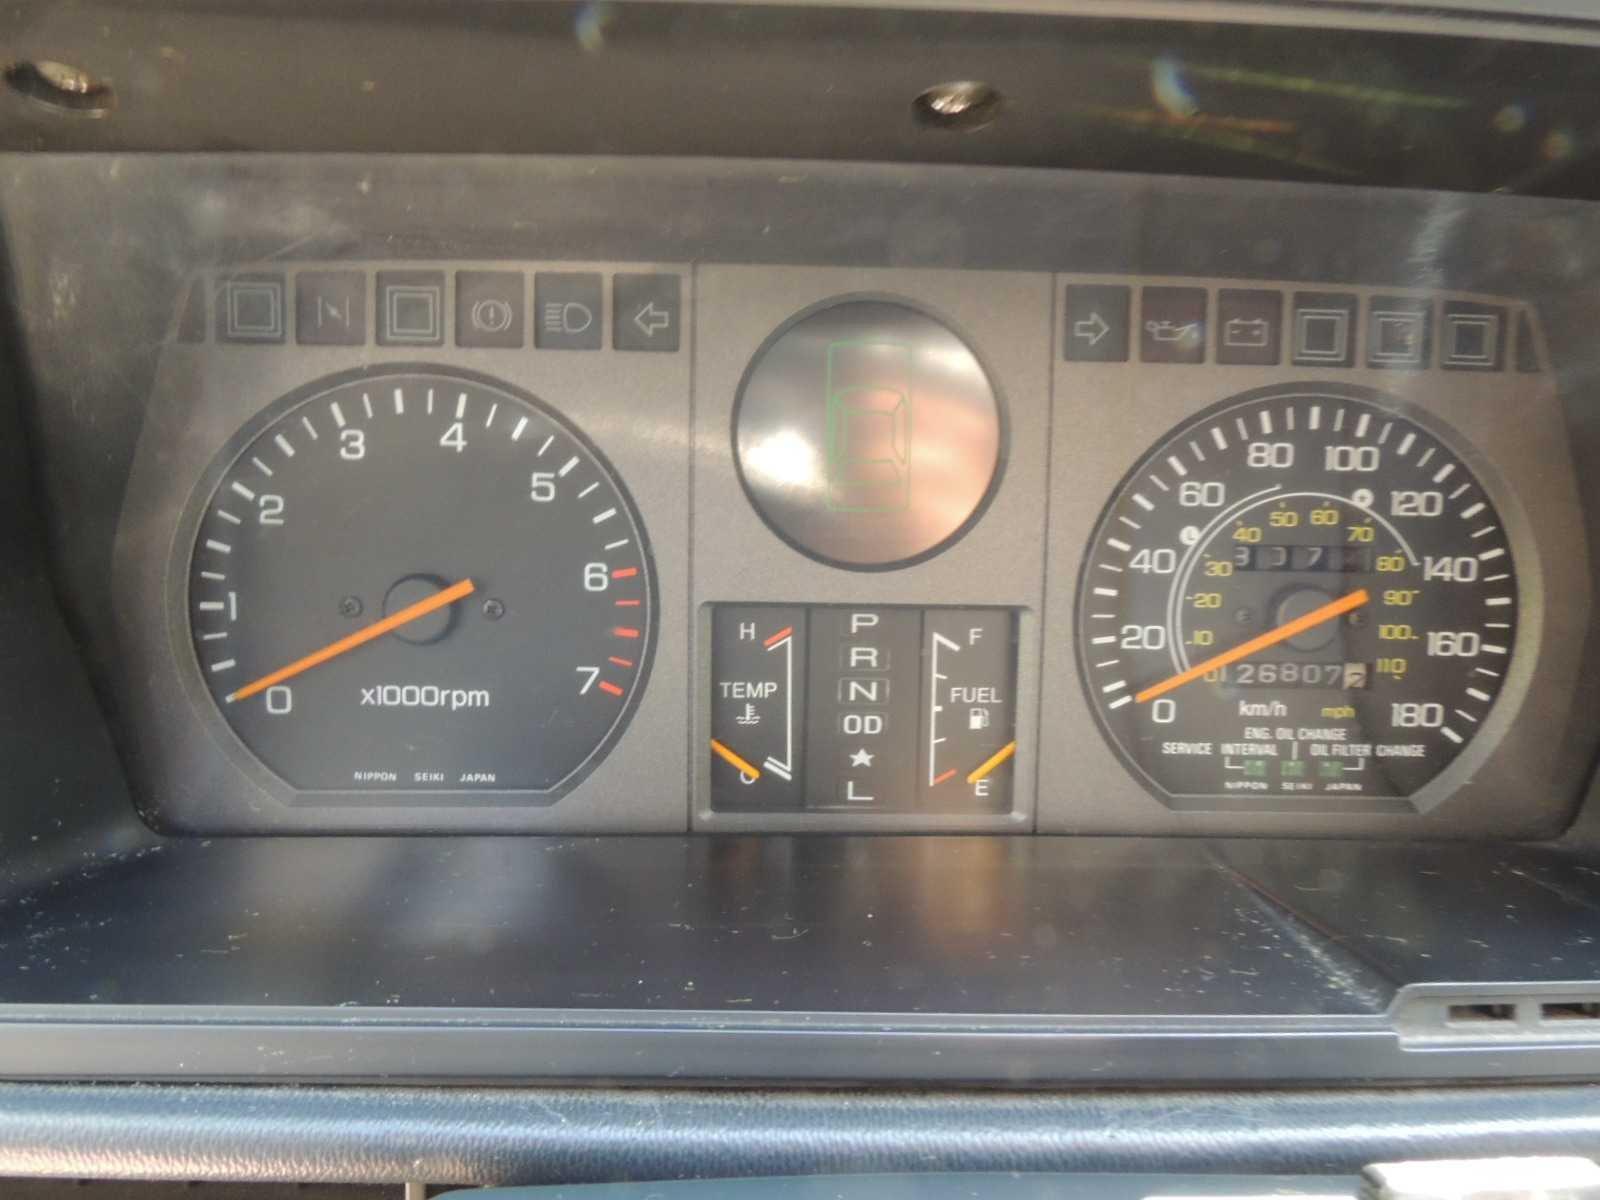 Honda Accord 1.6 EX Hondamatic 1983 Rutamotor Clásicos (46)